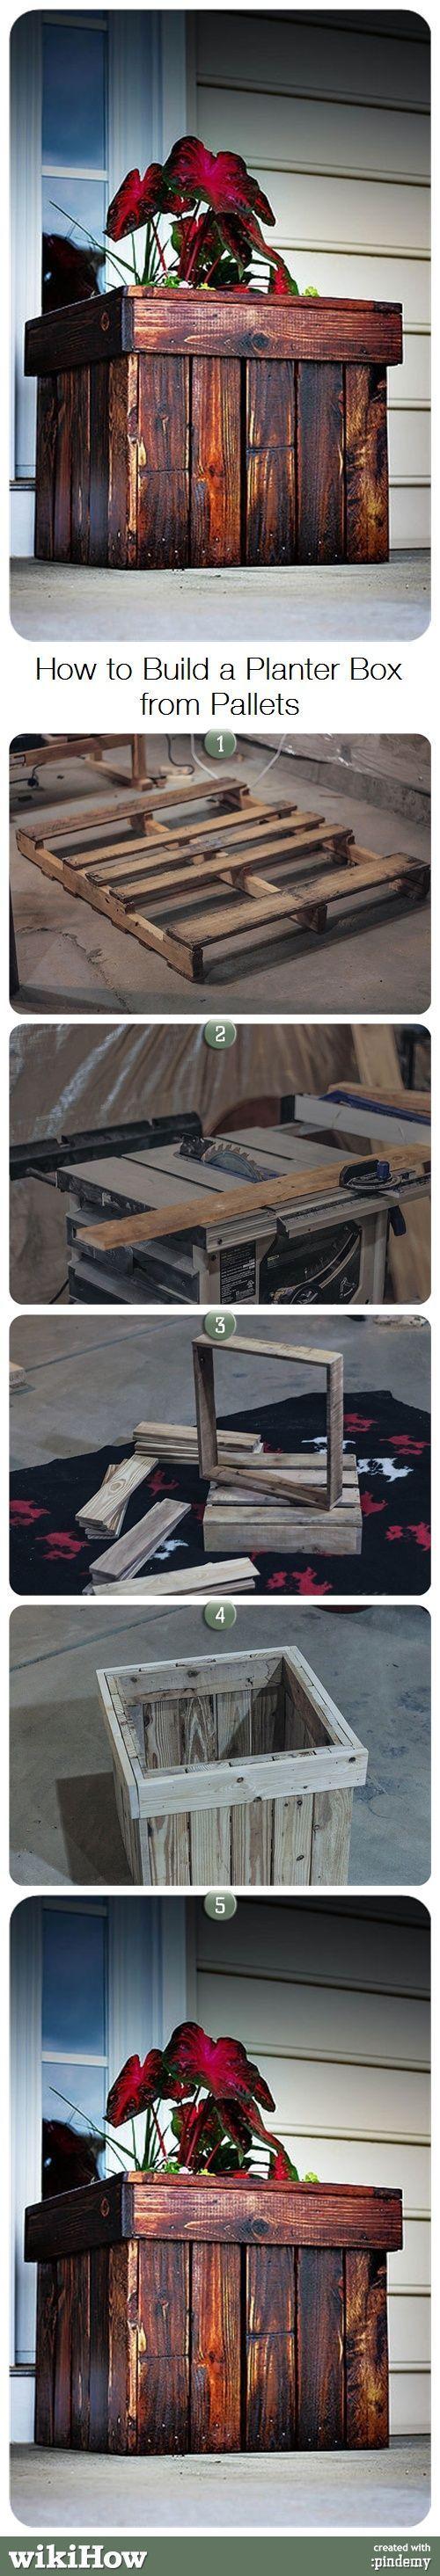 How to Build a Planter Box from Pallets pin_it DIY #wood #furniture @mundodascasas www.mundodascasas.com.br